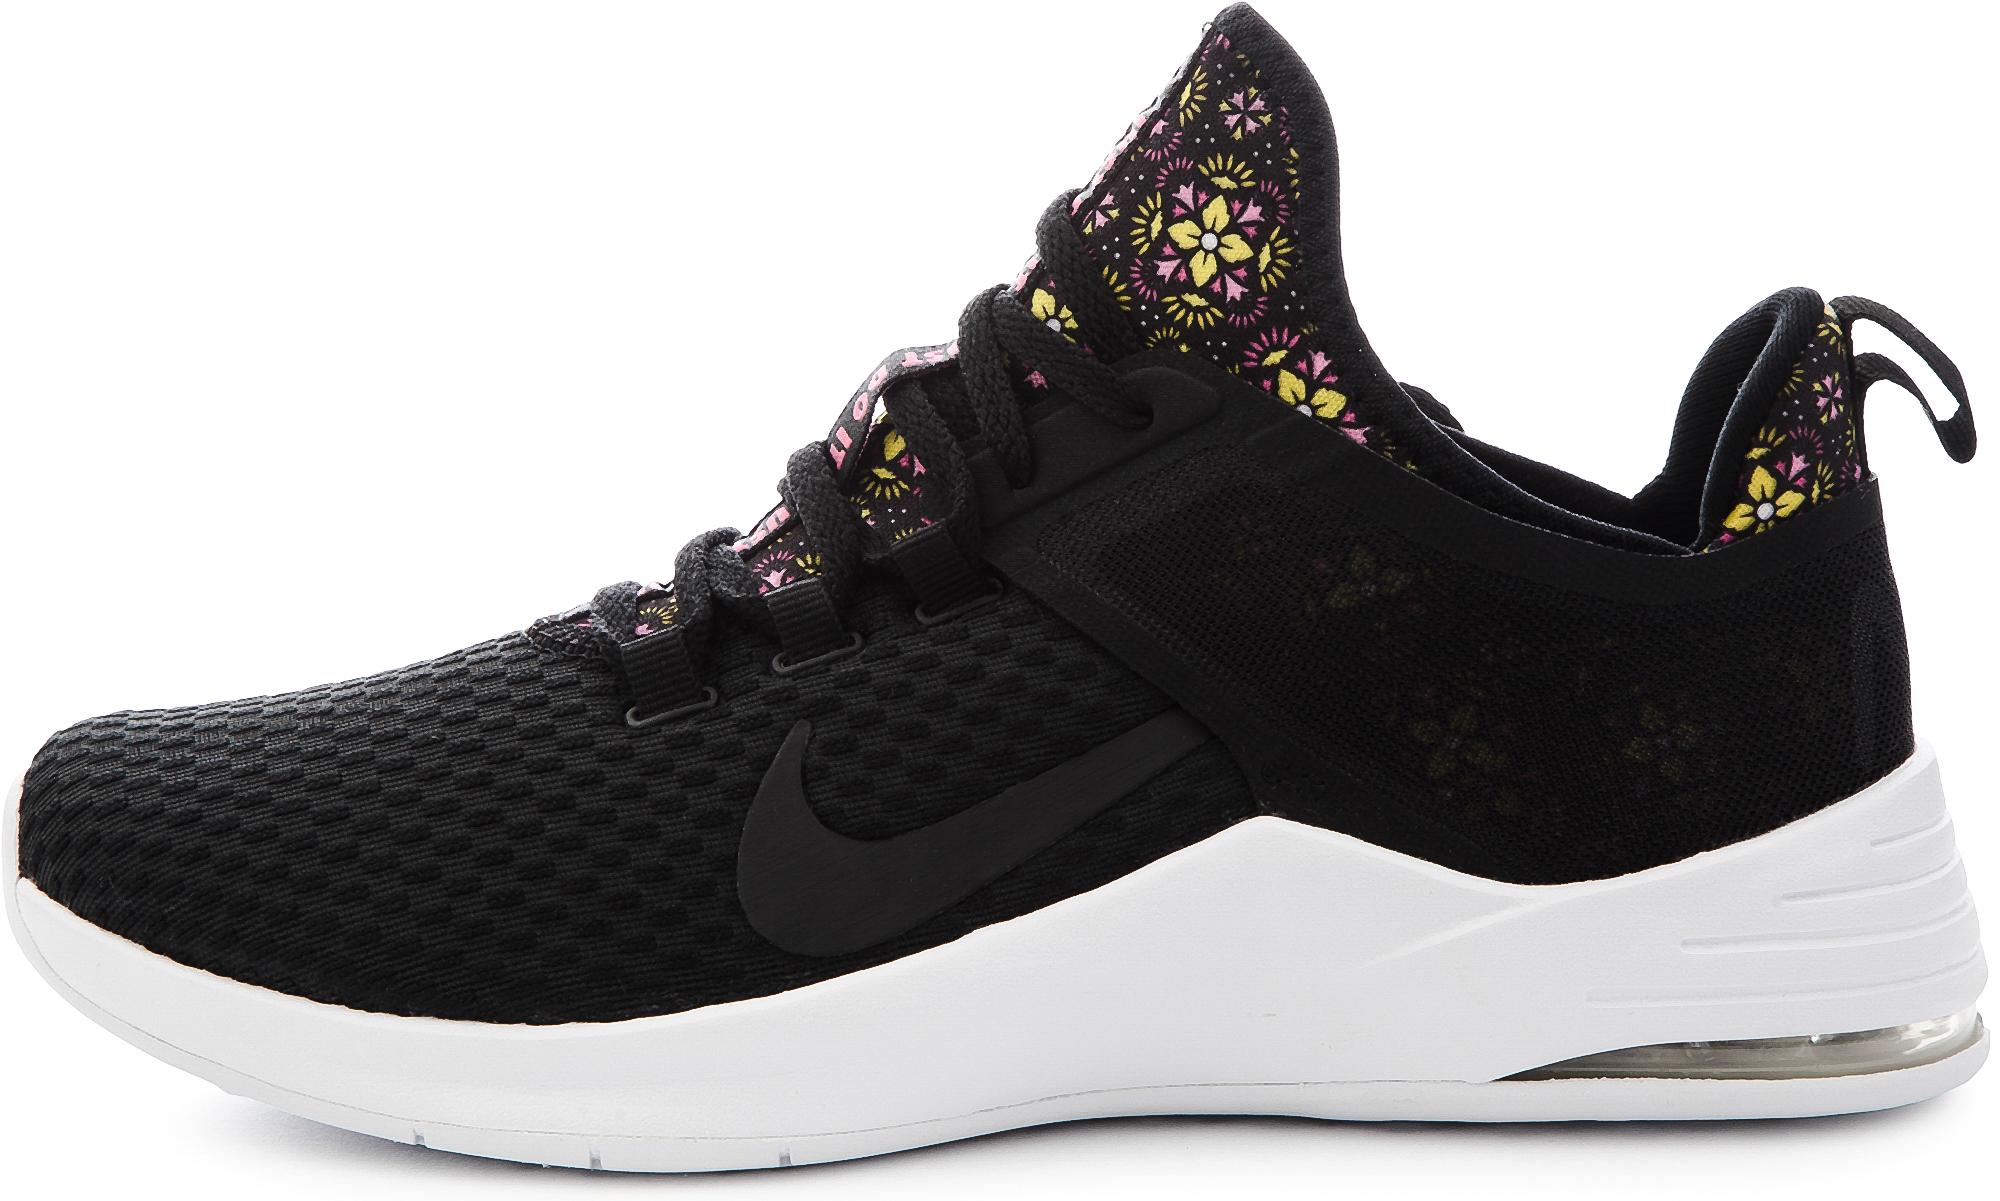 Nike Кроссовки женские Air Max Bella TR 2, размер 38